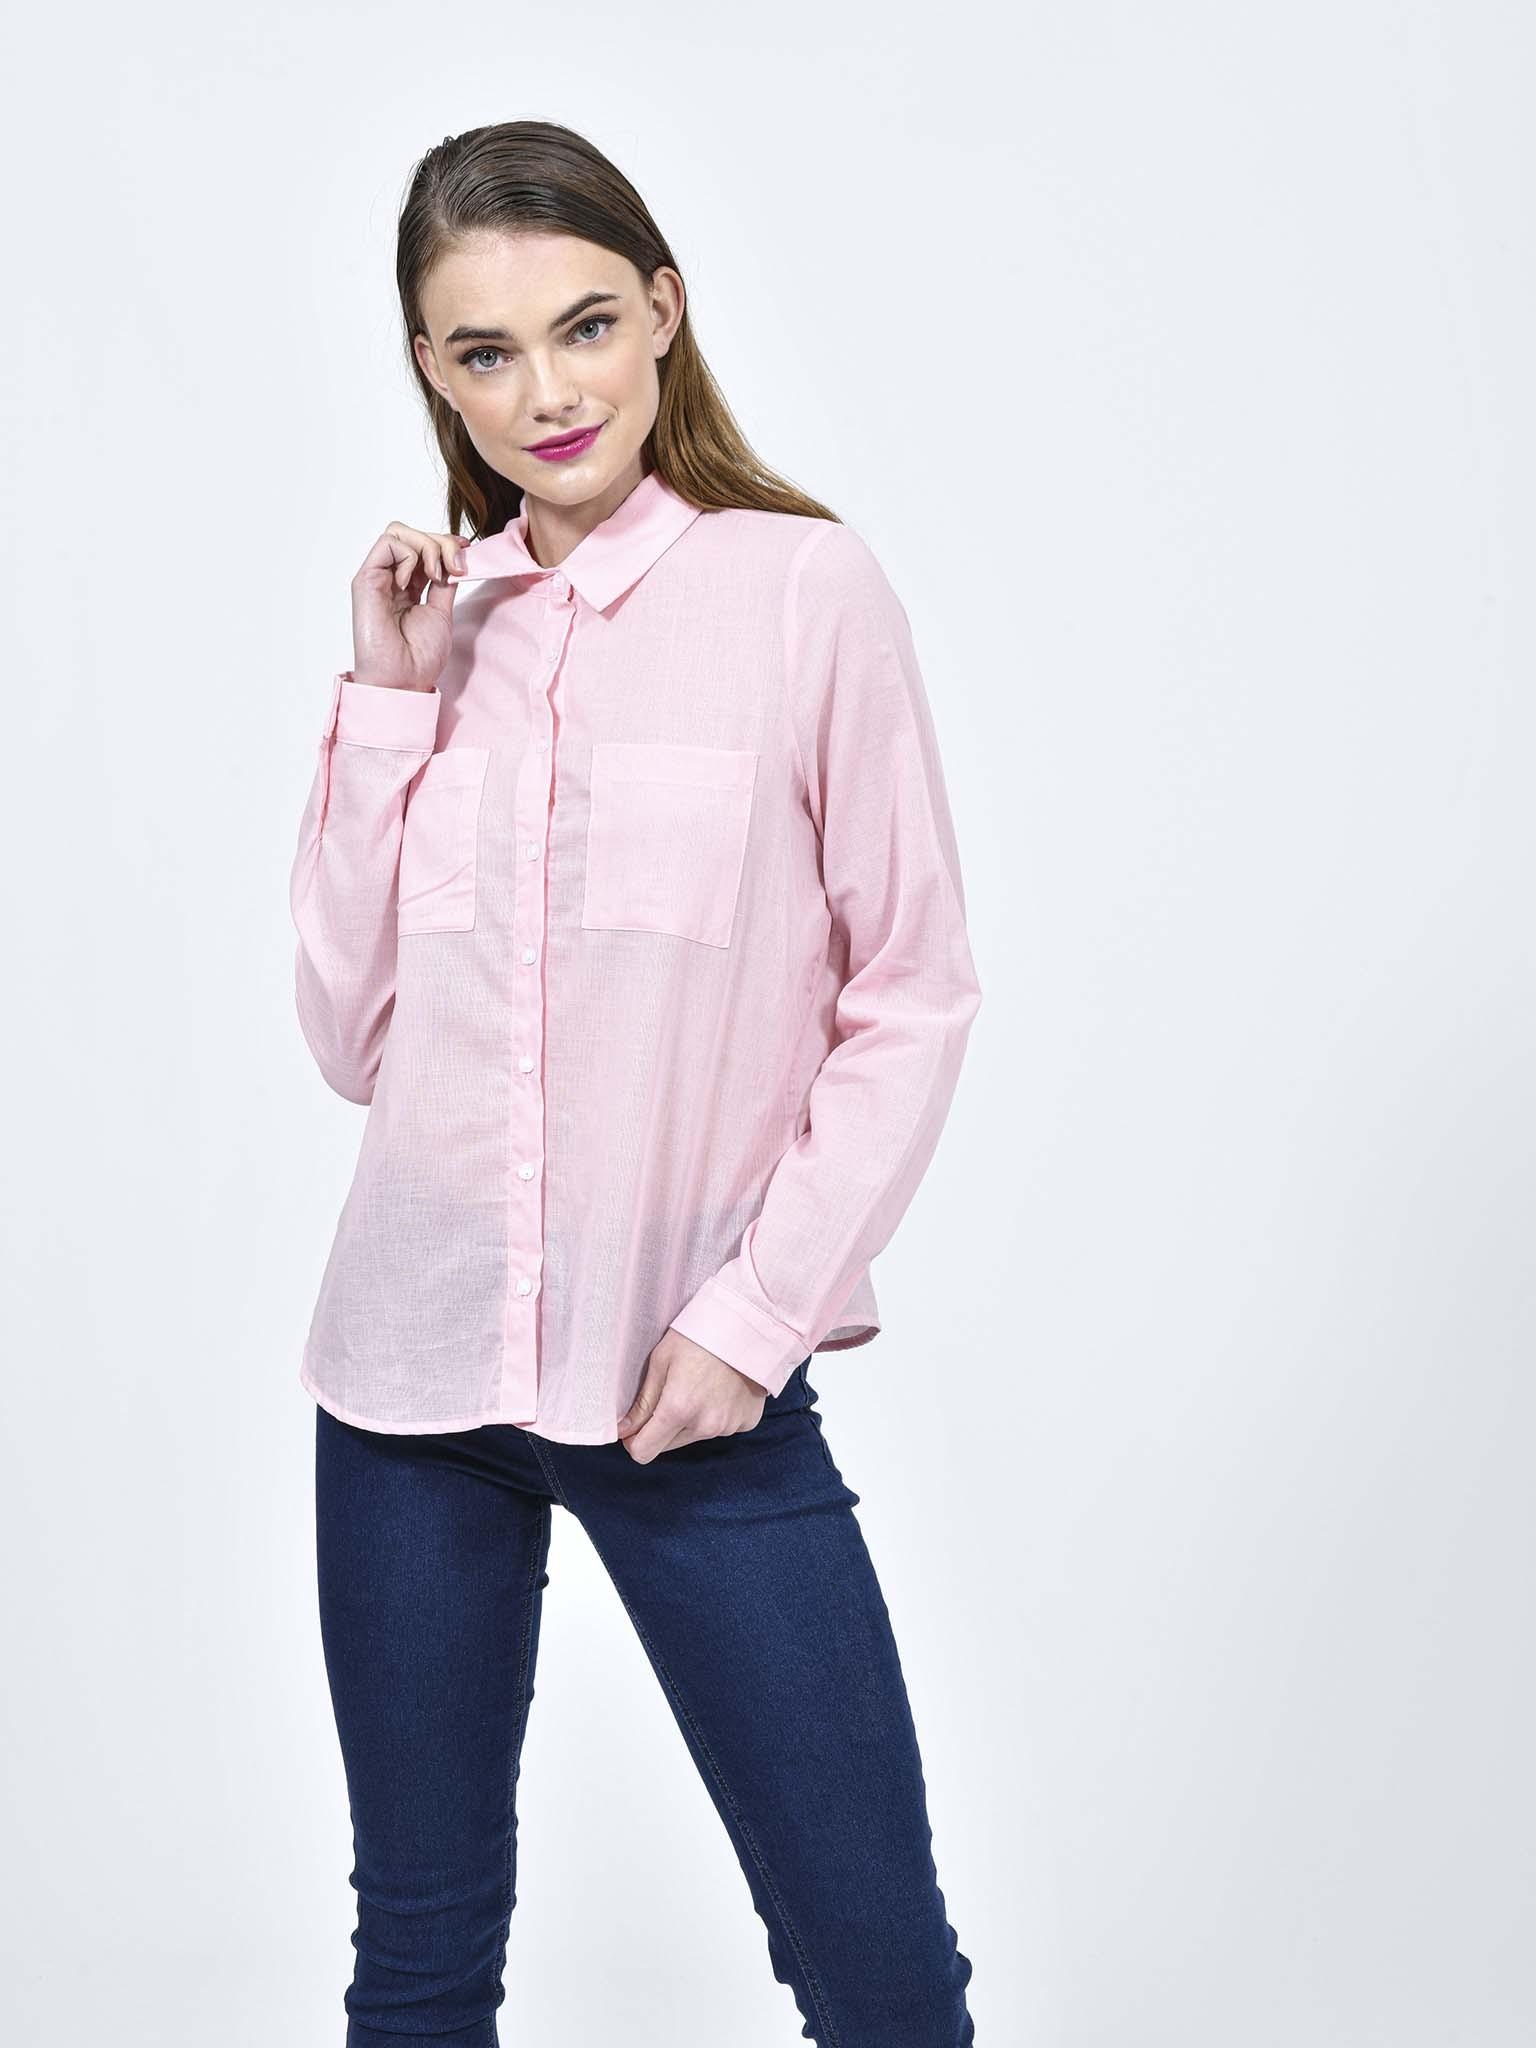 Oferta de Blusa Rosa Cuello Clásico por $149